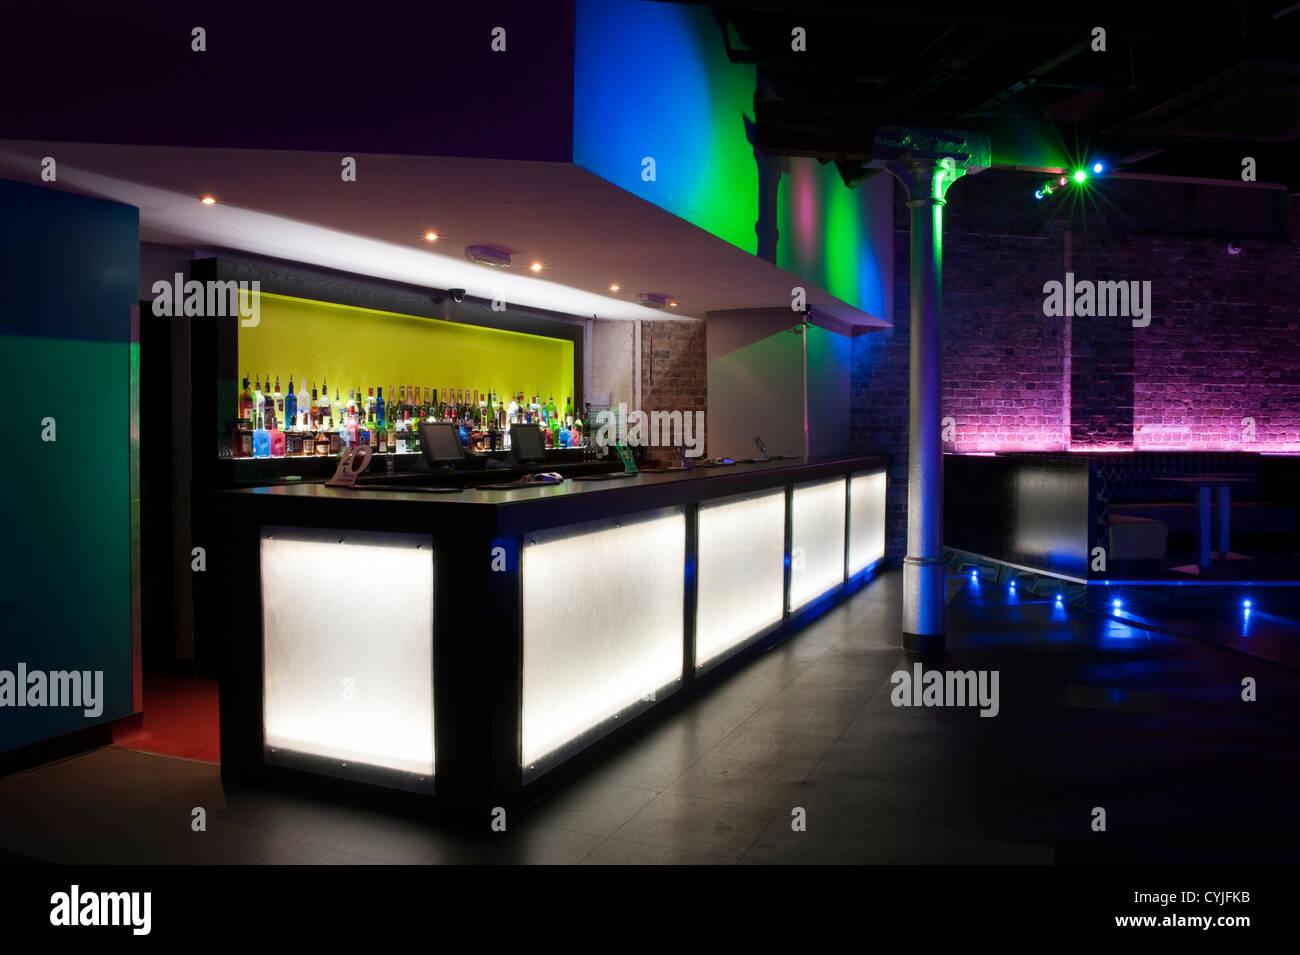 Night Club Bar Area Interior Design Stock Photo Royalty Free Image 51423887 Alamy